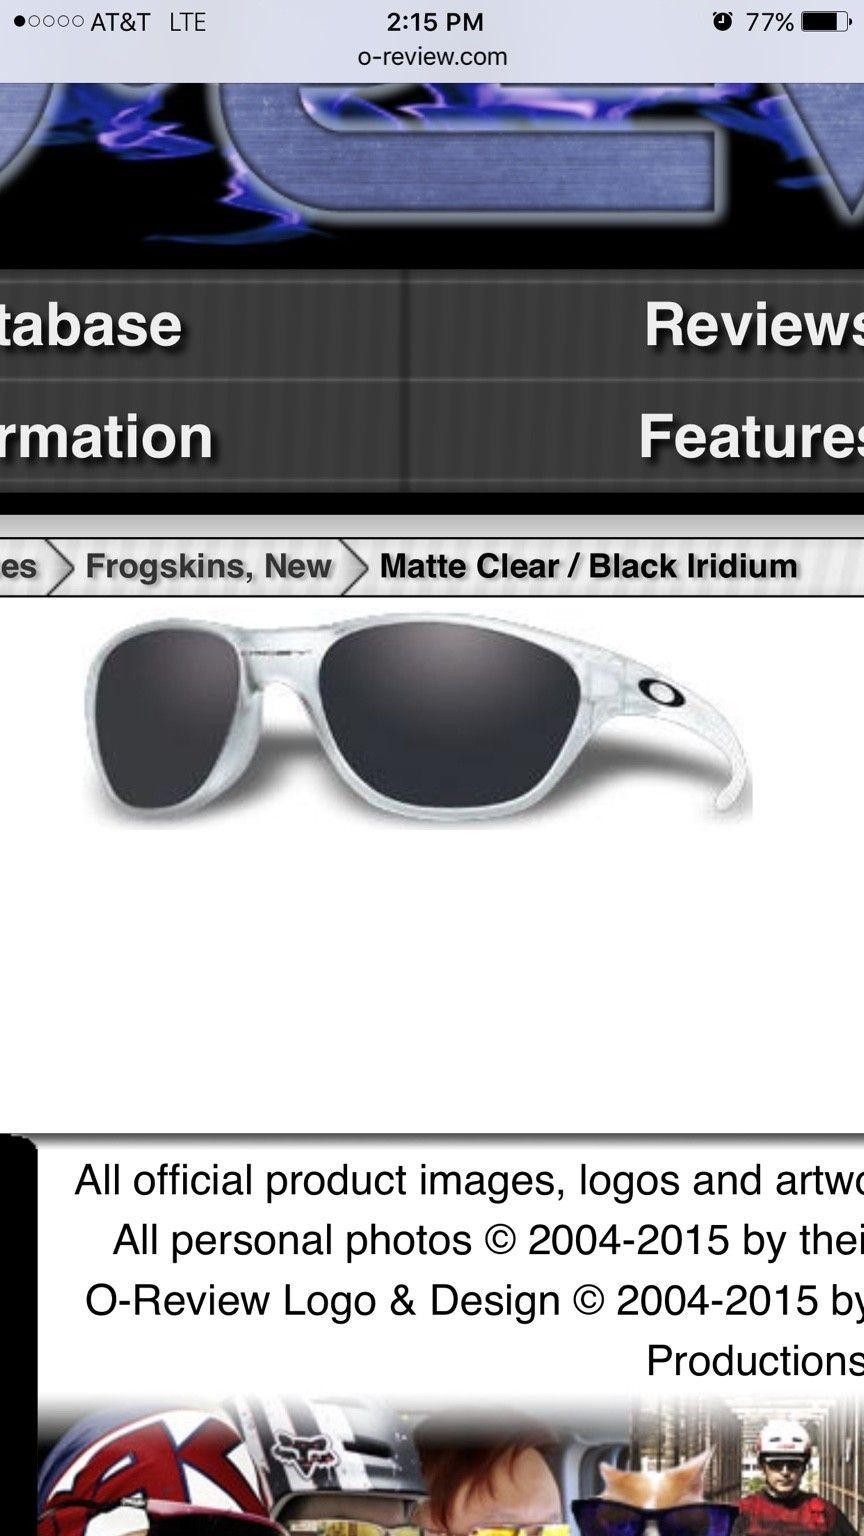 New Frogskins (1996-2004 redesigned) Matte Clear/BI FOUND - ImageUploadedByTapatalk1444348131.969989.jpg